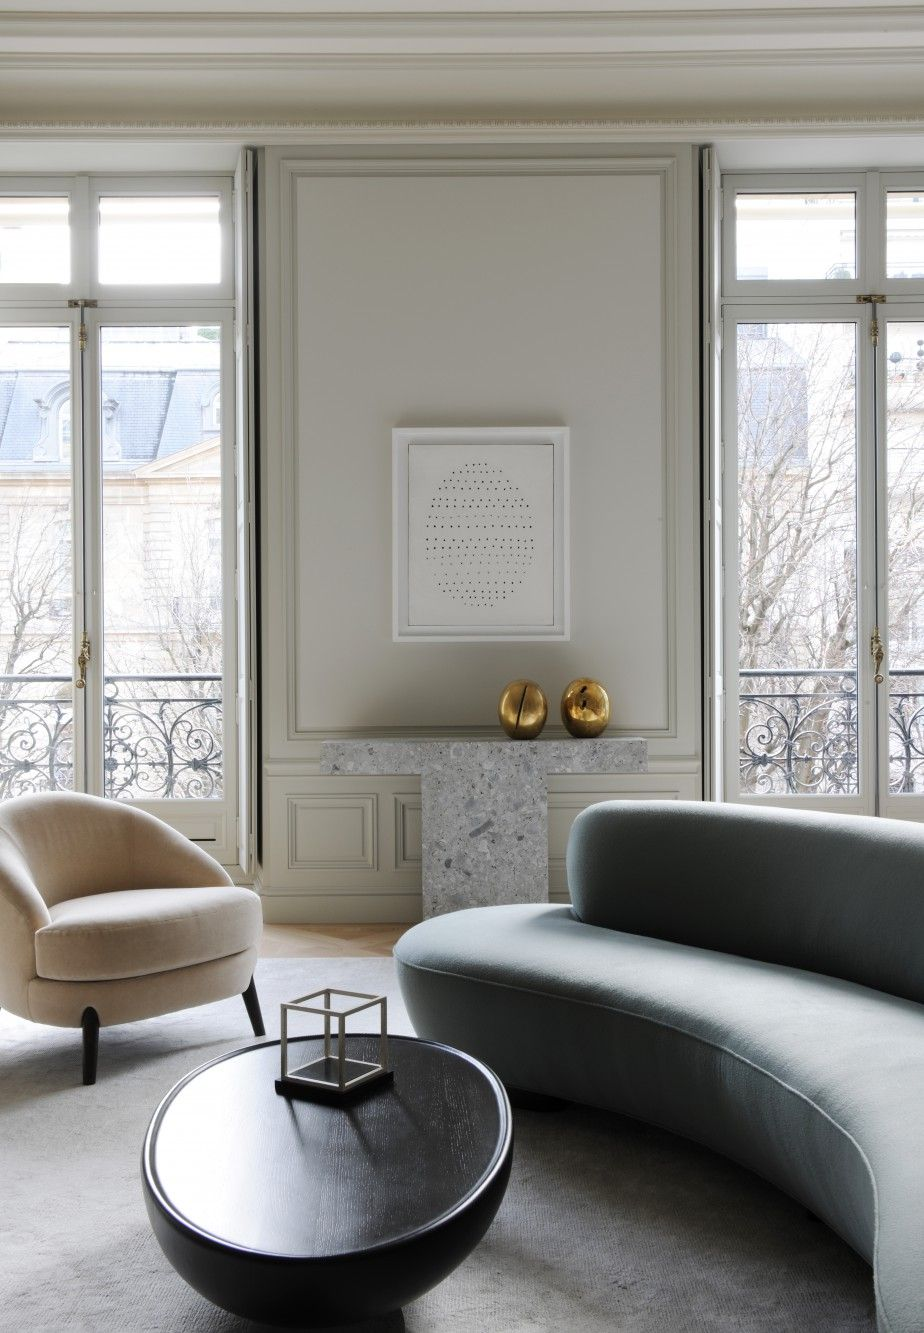 Joseph dirand architecture montaigne parisian apartment apartment living modern minimalist living room